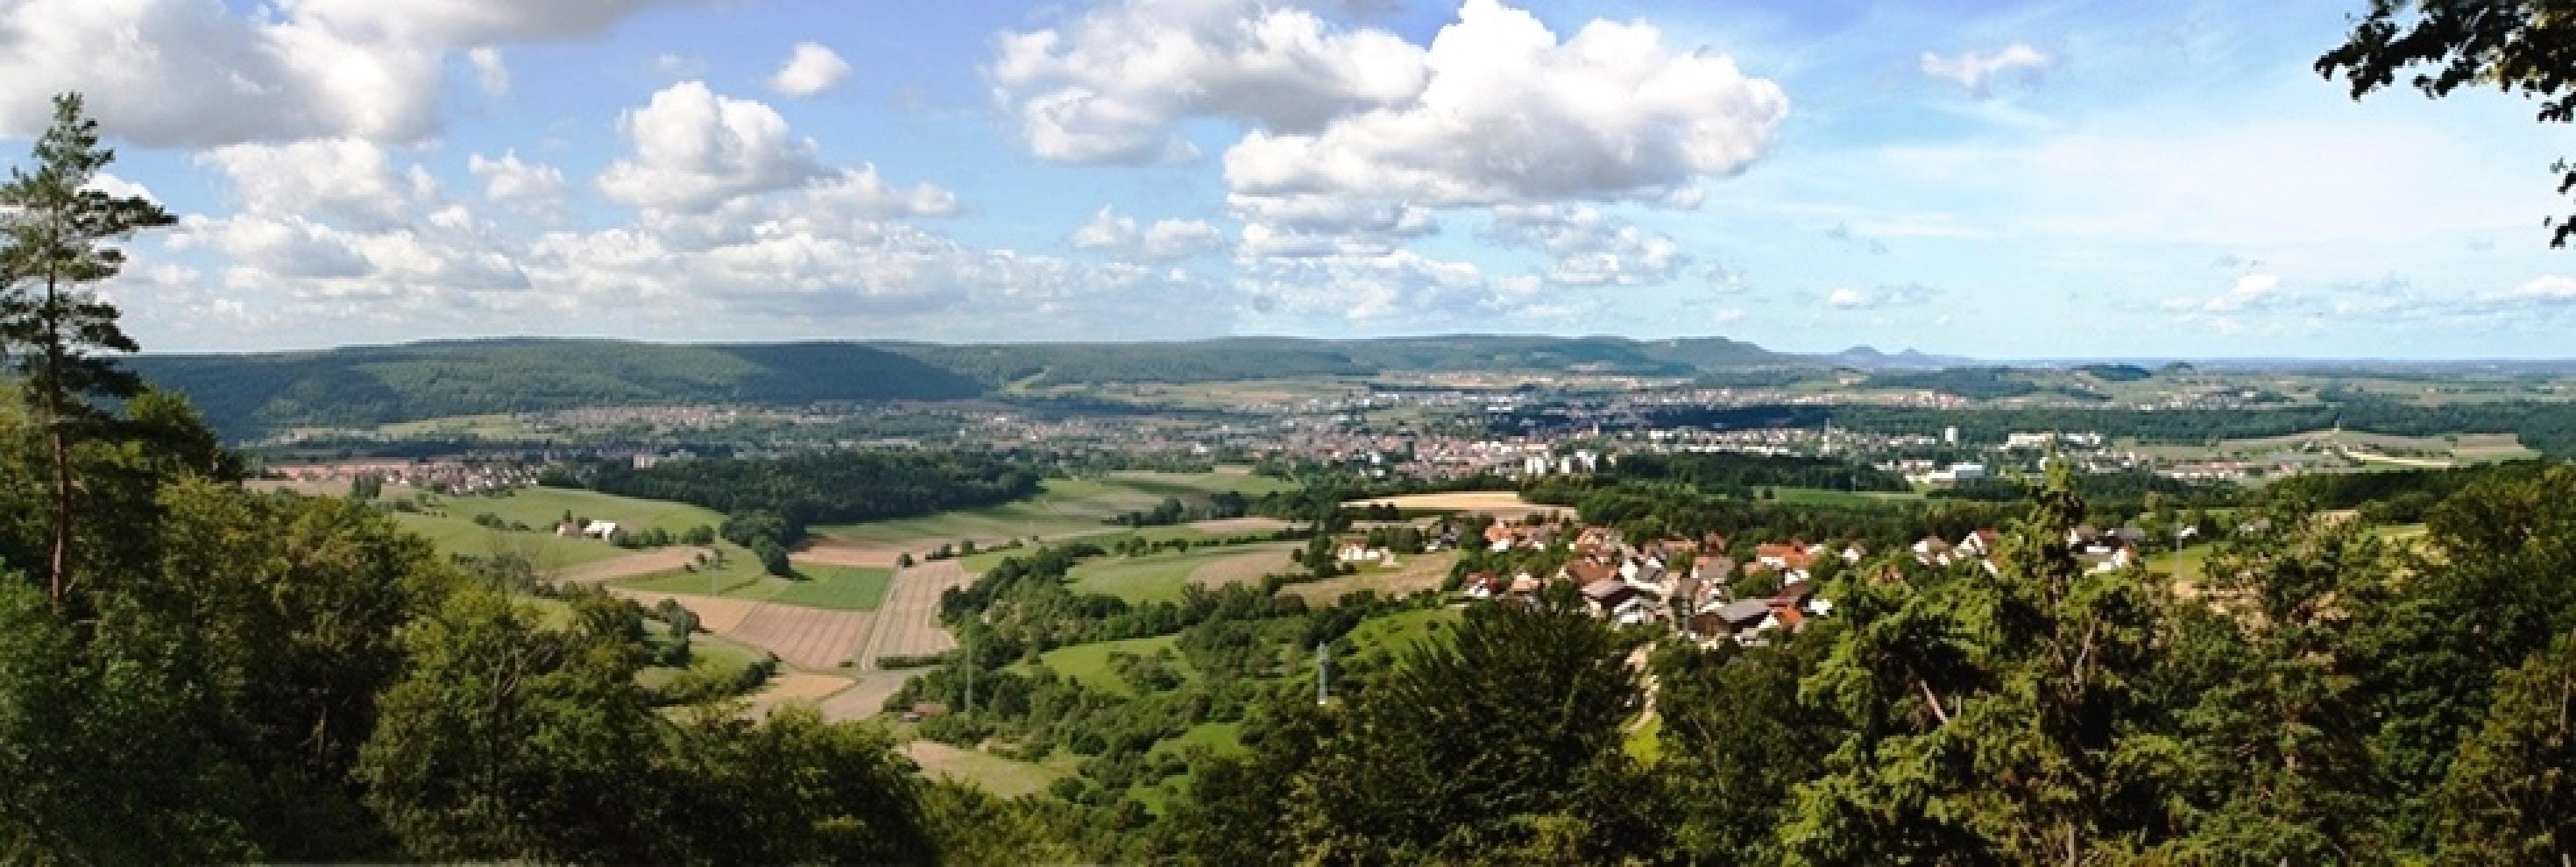 NFH Brauenberg - Blick auf die Kaiserberge